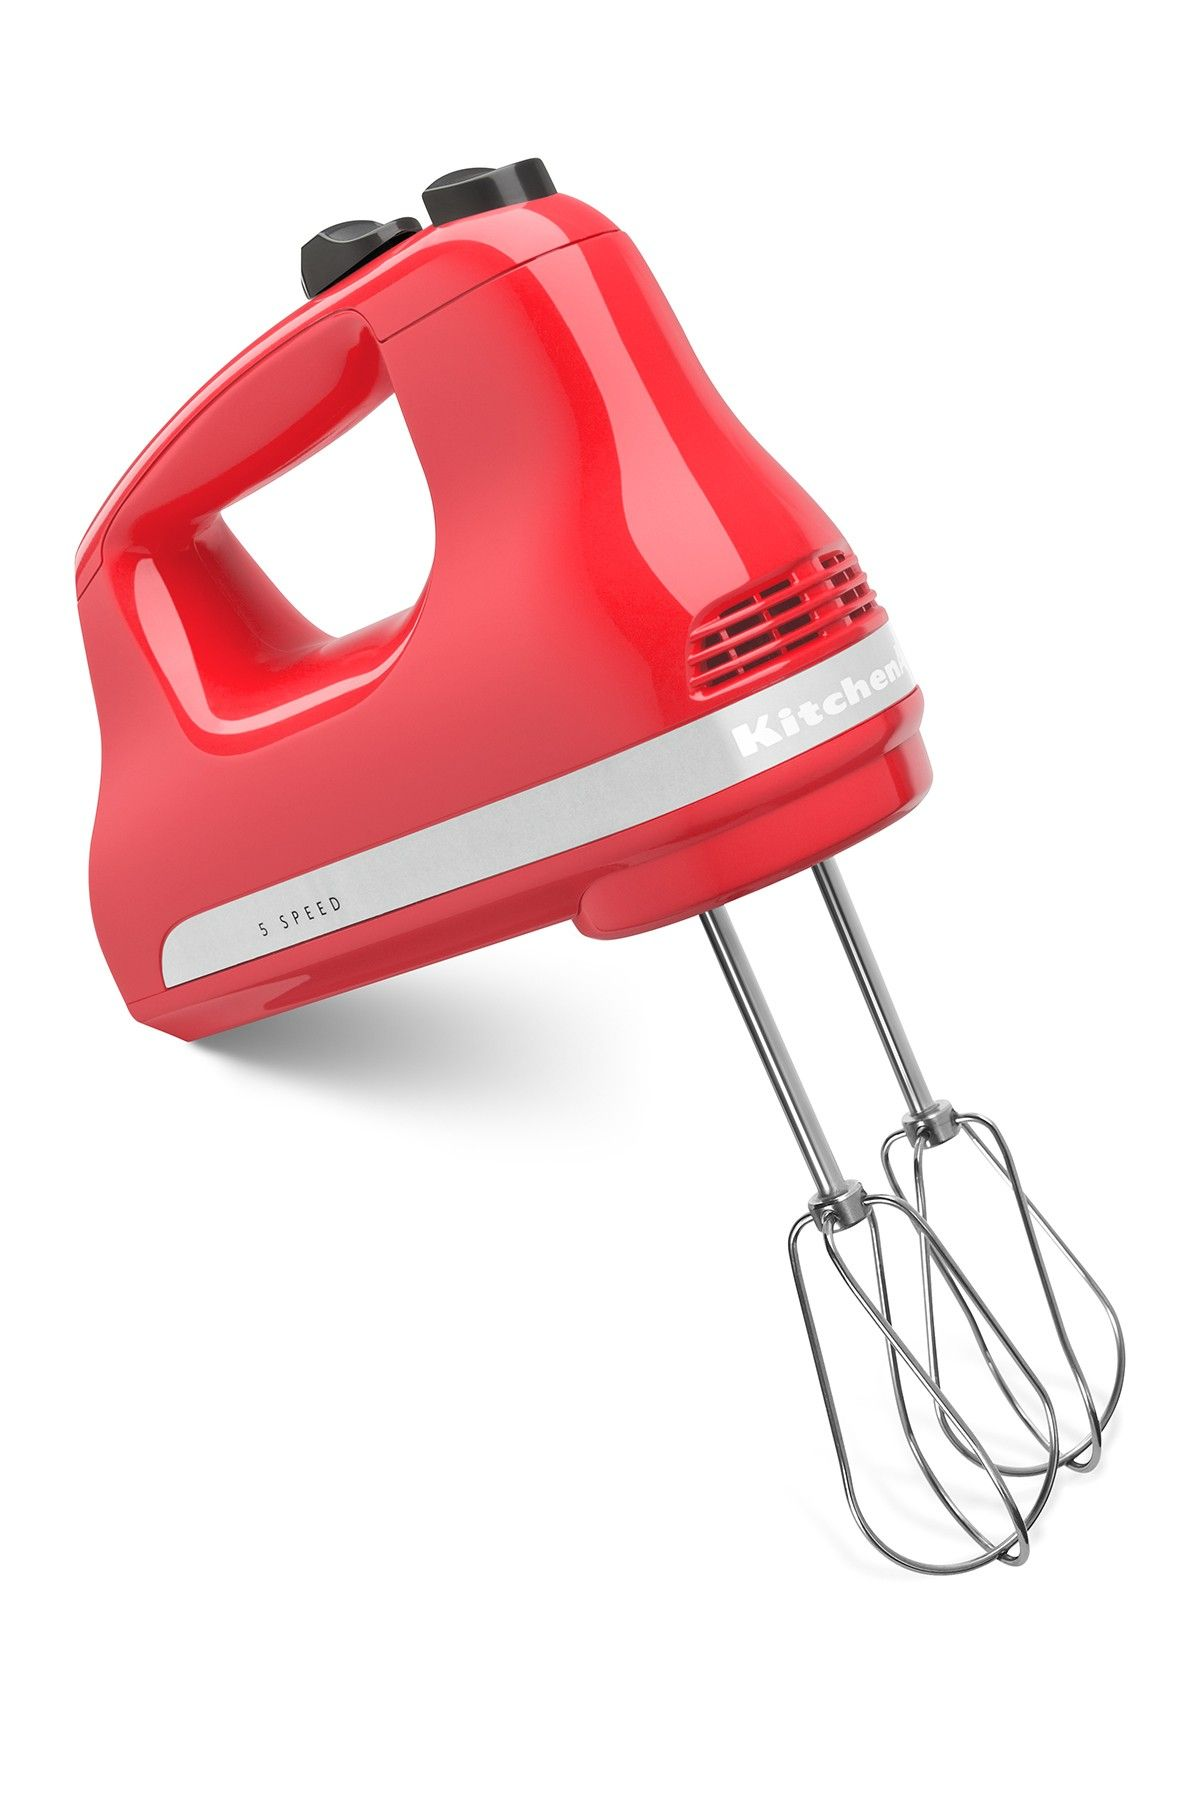 Kitchenaid 5speed hand mixer hand mixer mixer mixers